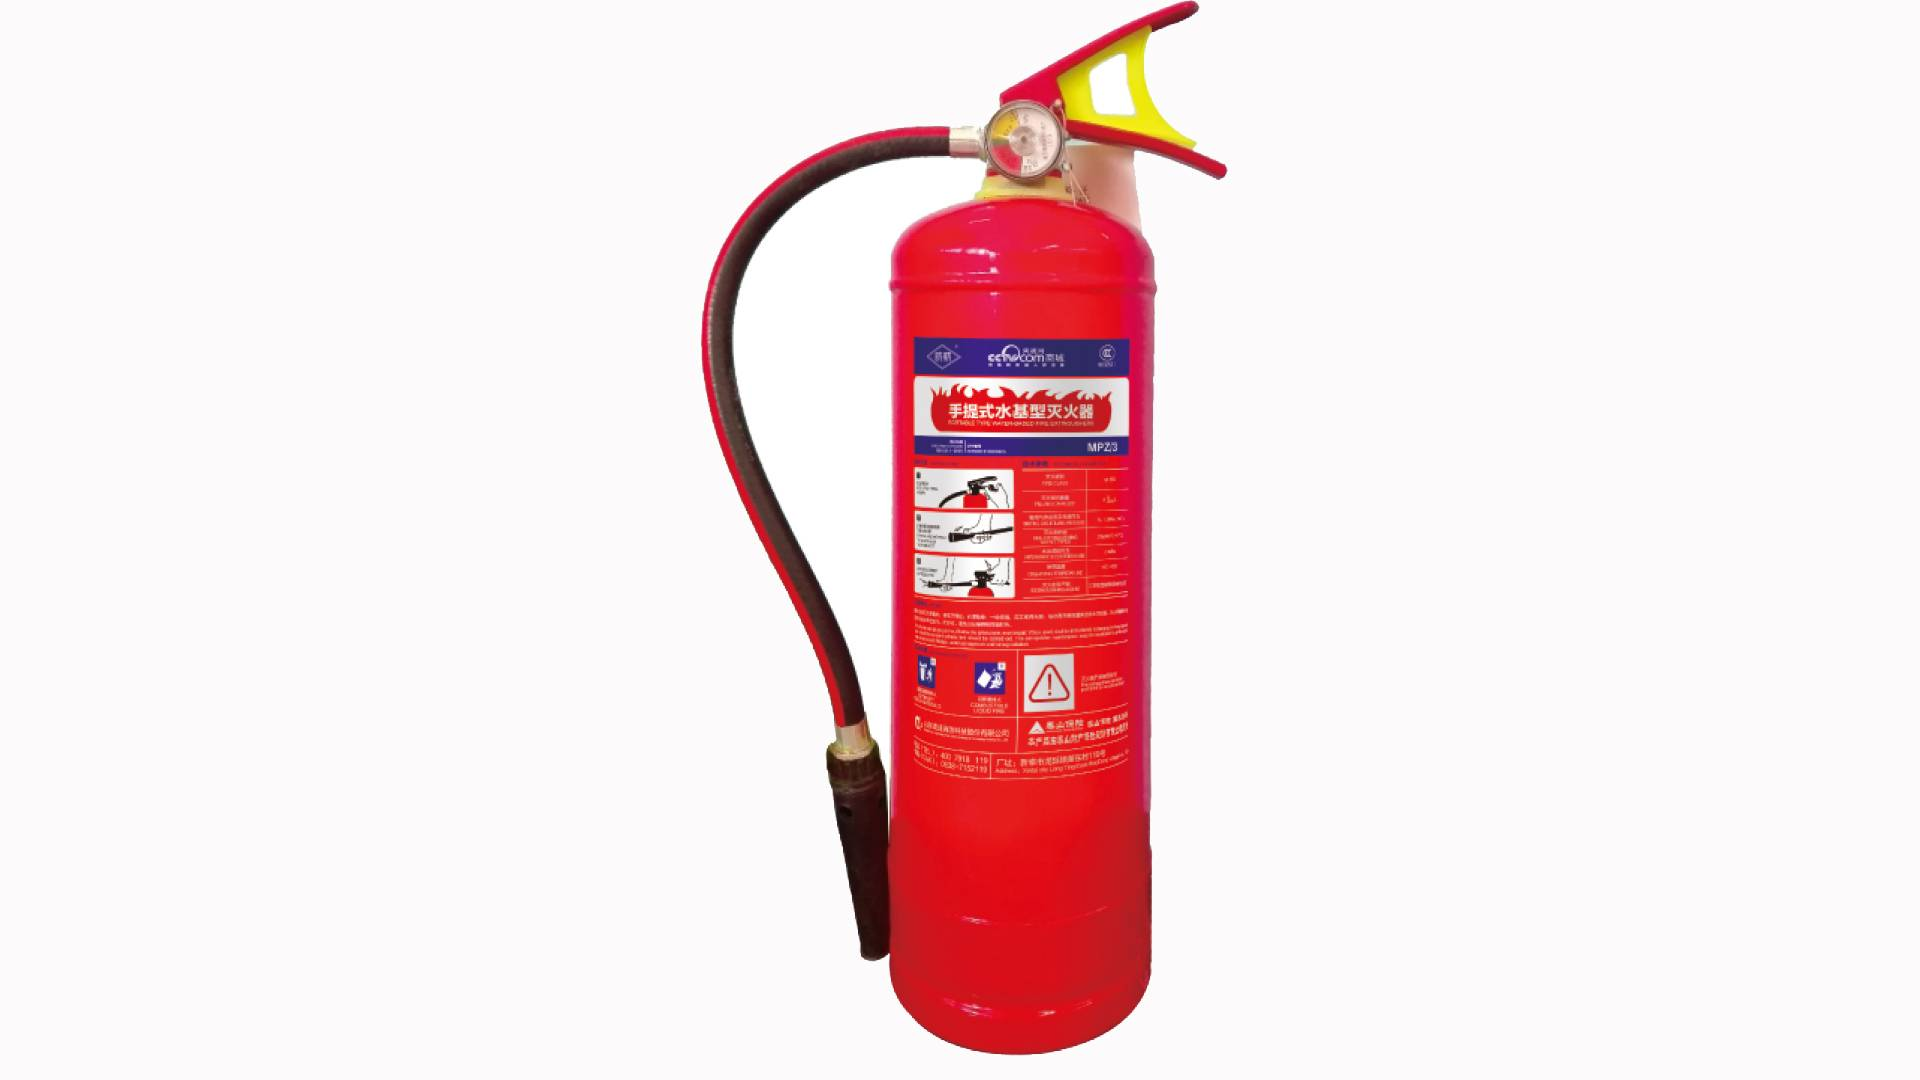 Hot sales fire extinguisher ball in Vietnam